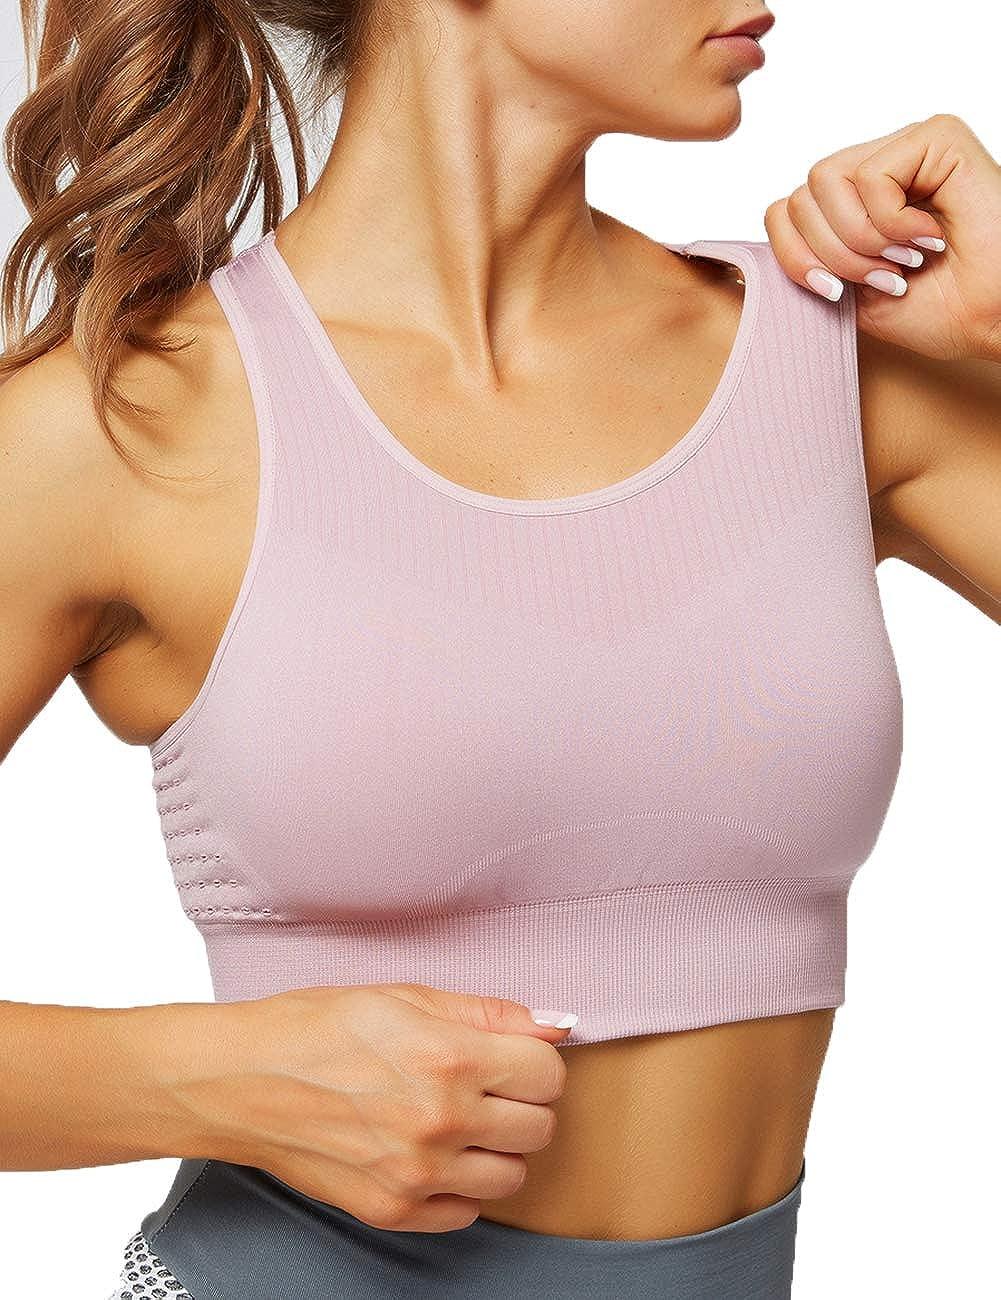 Huret Medium Impact Seamless Sports Bra for Women Plus Workout Yoga Padded Bra